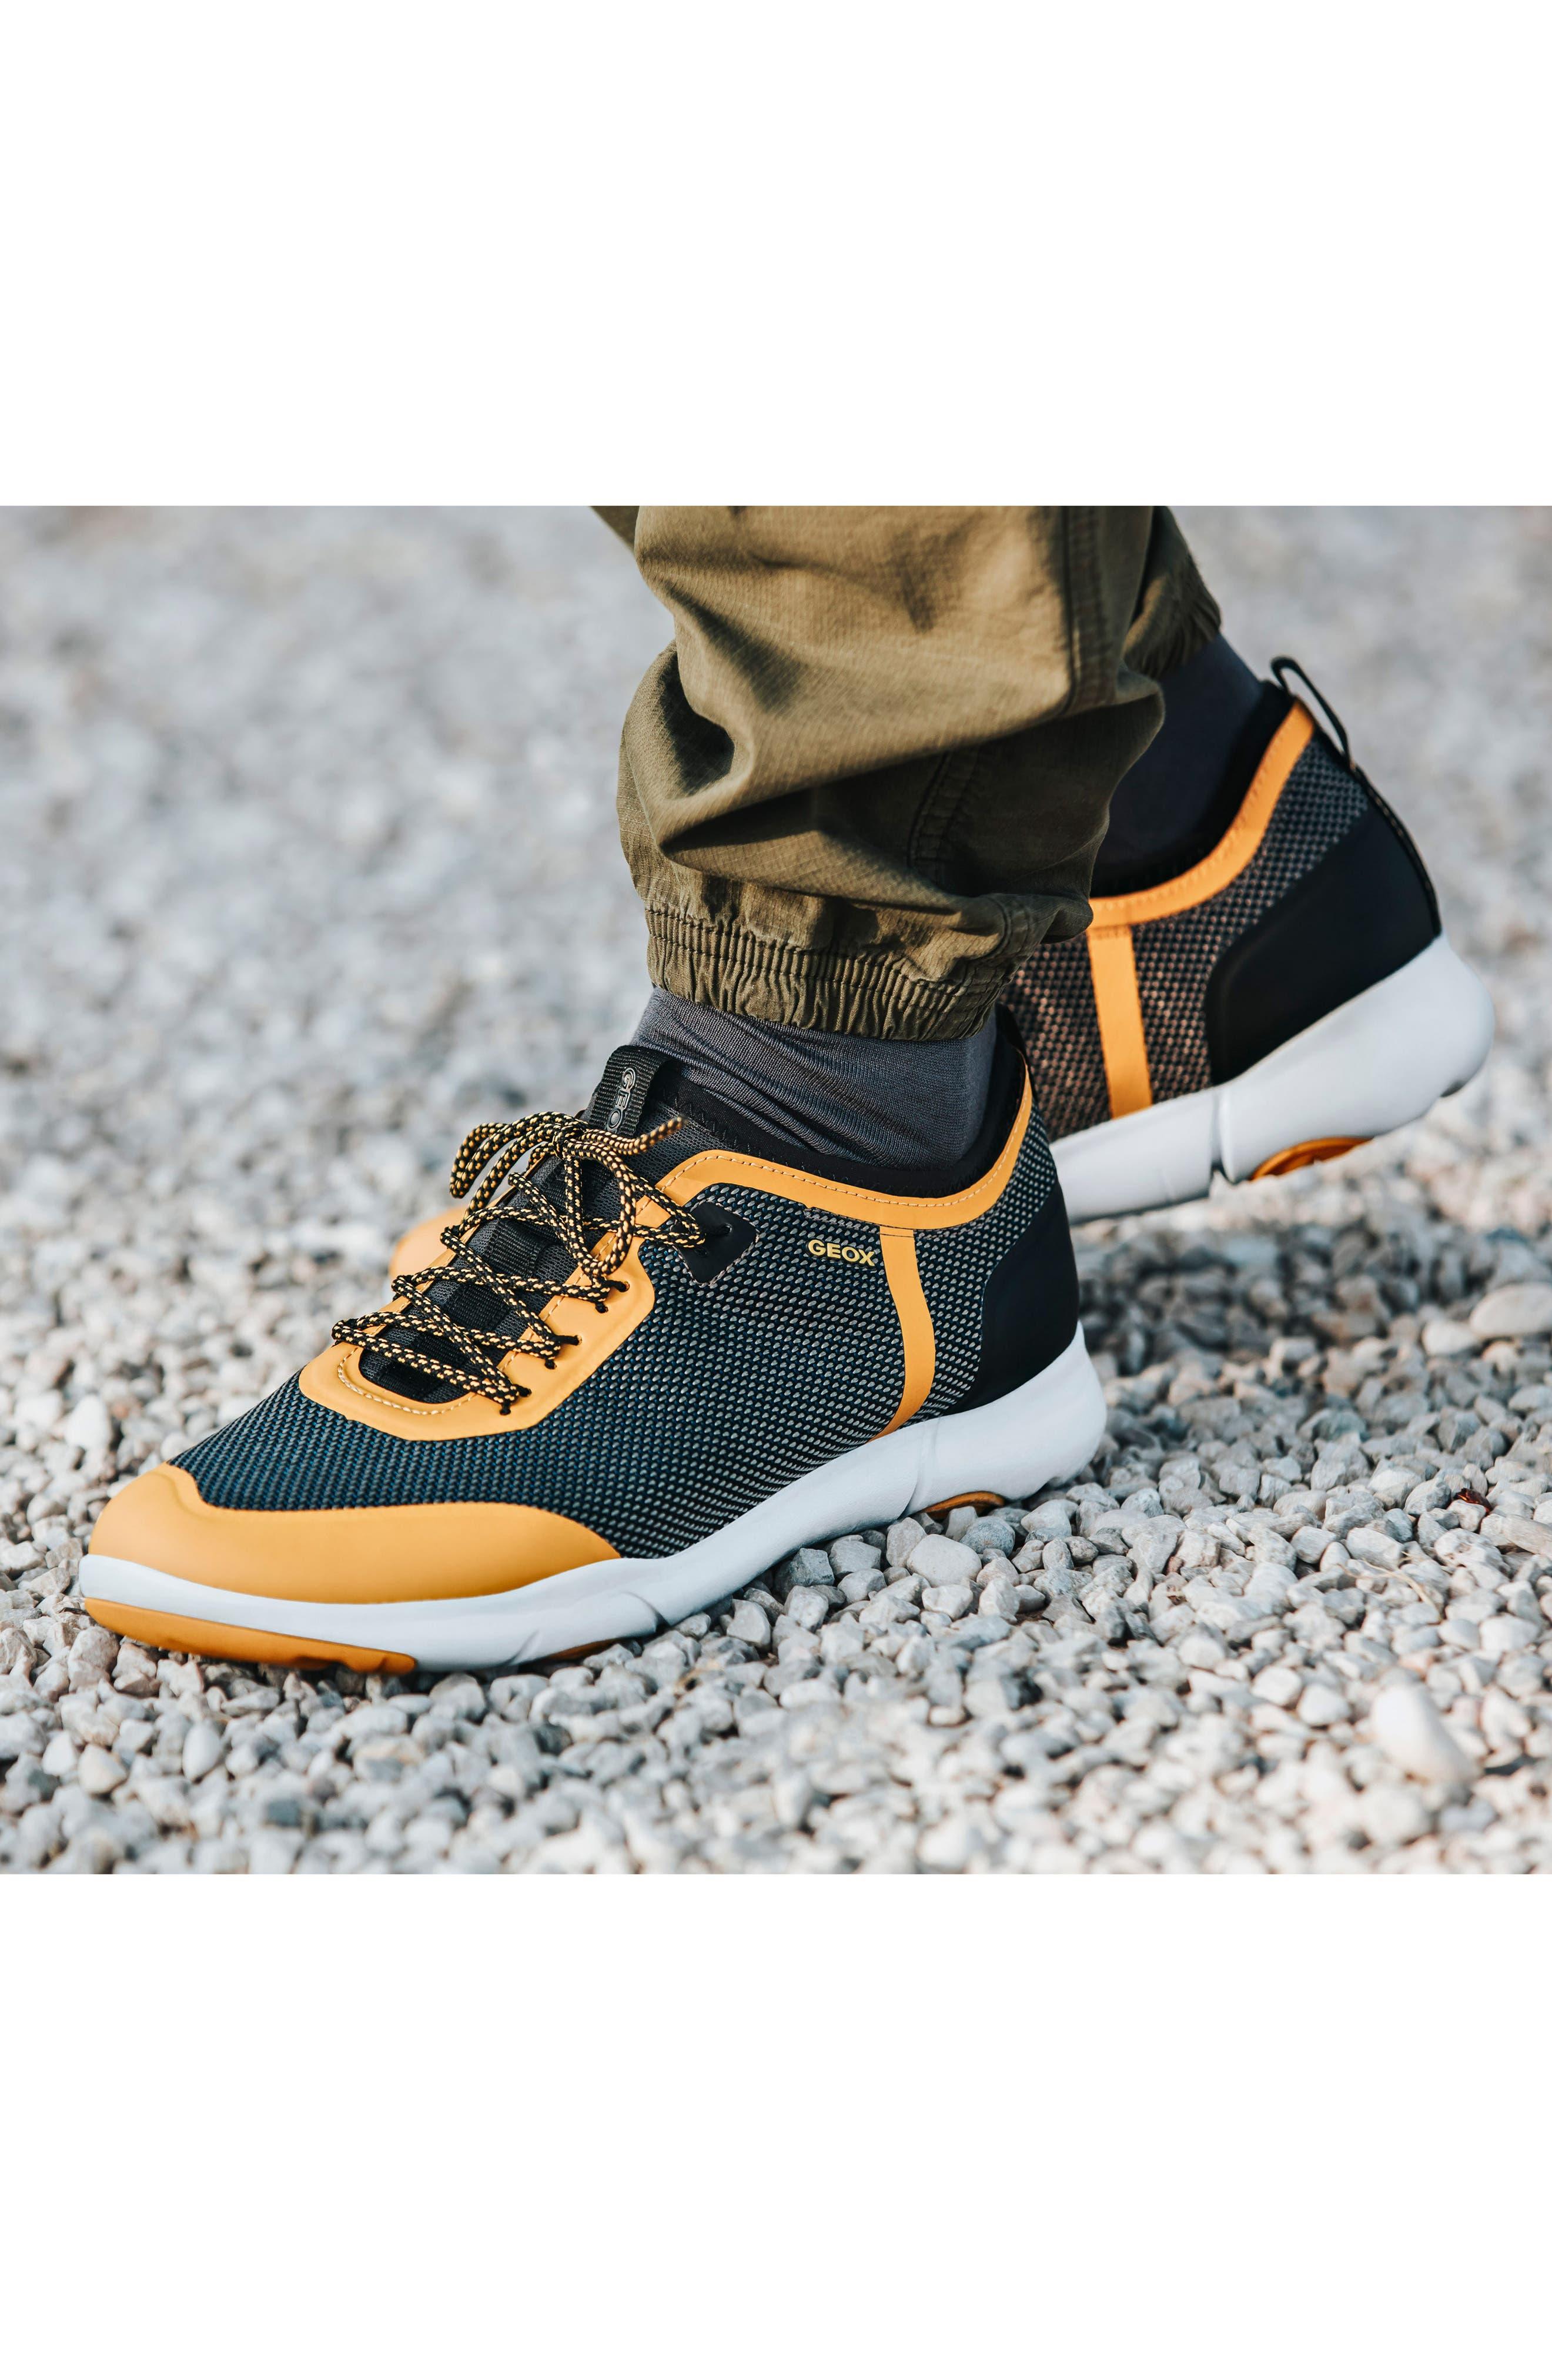 Nebula X 3 Low Top Sneaker,                             Alternate thumbnail 7, color,                             BLACK LEATHER